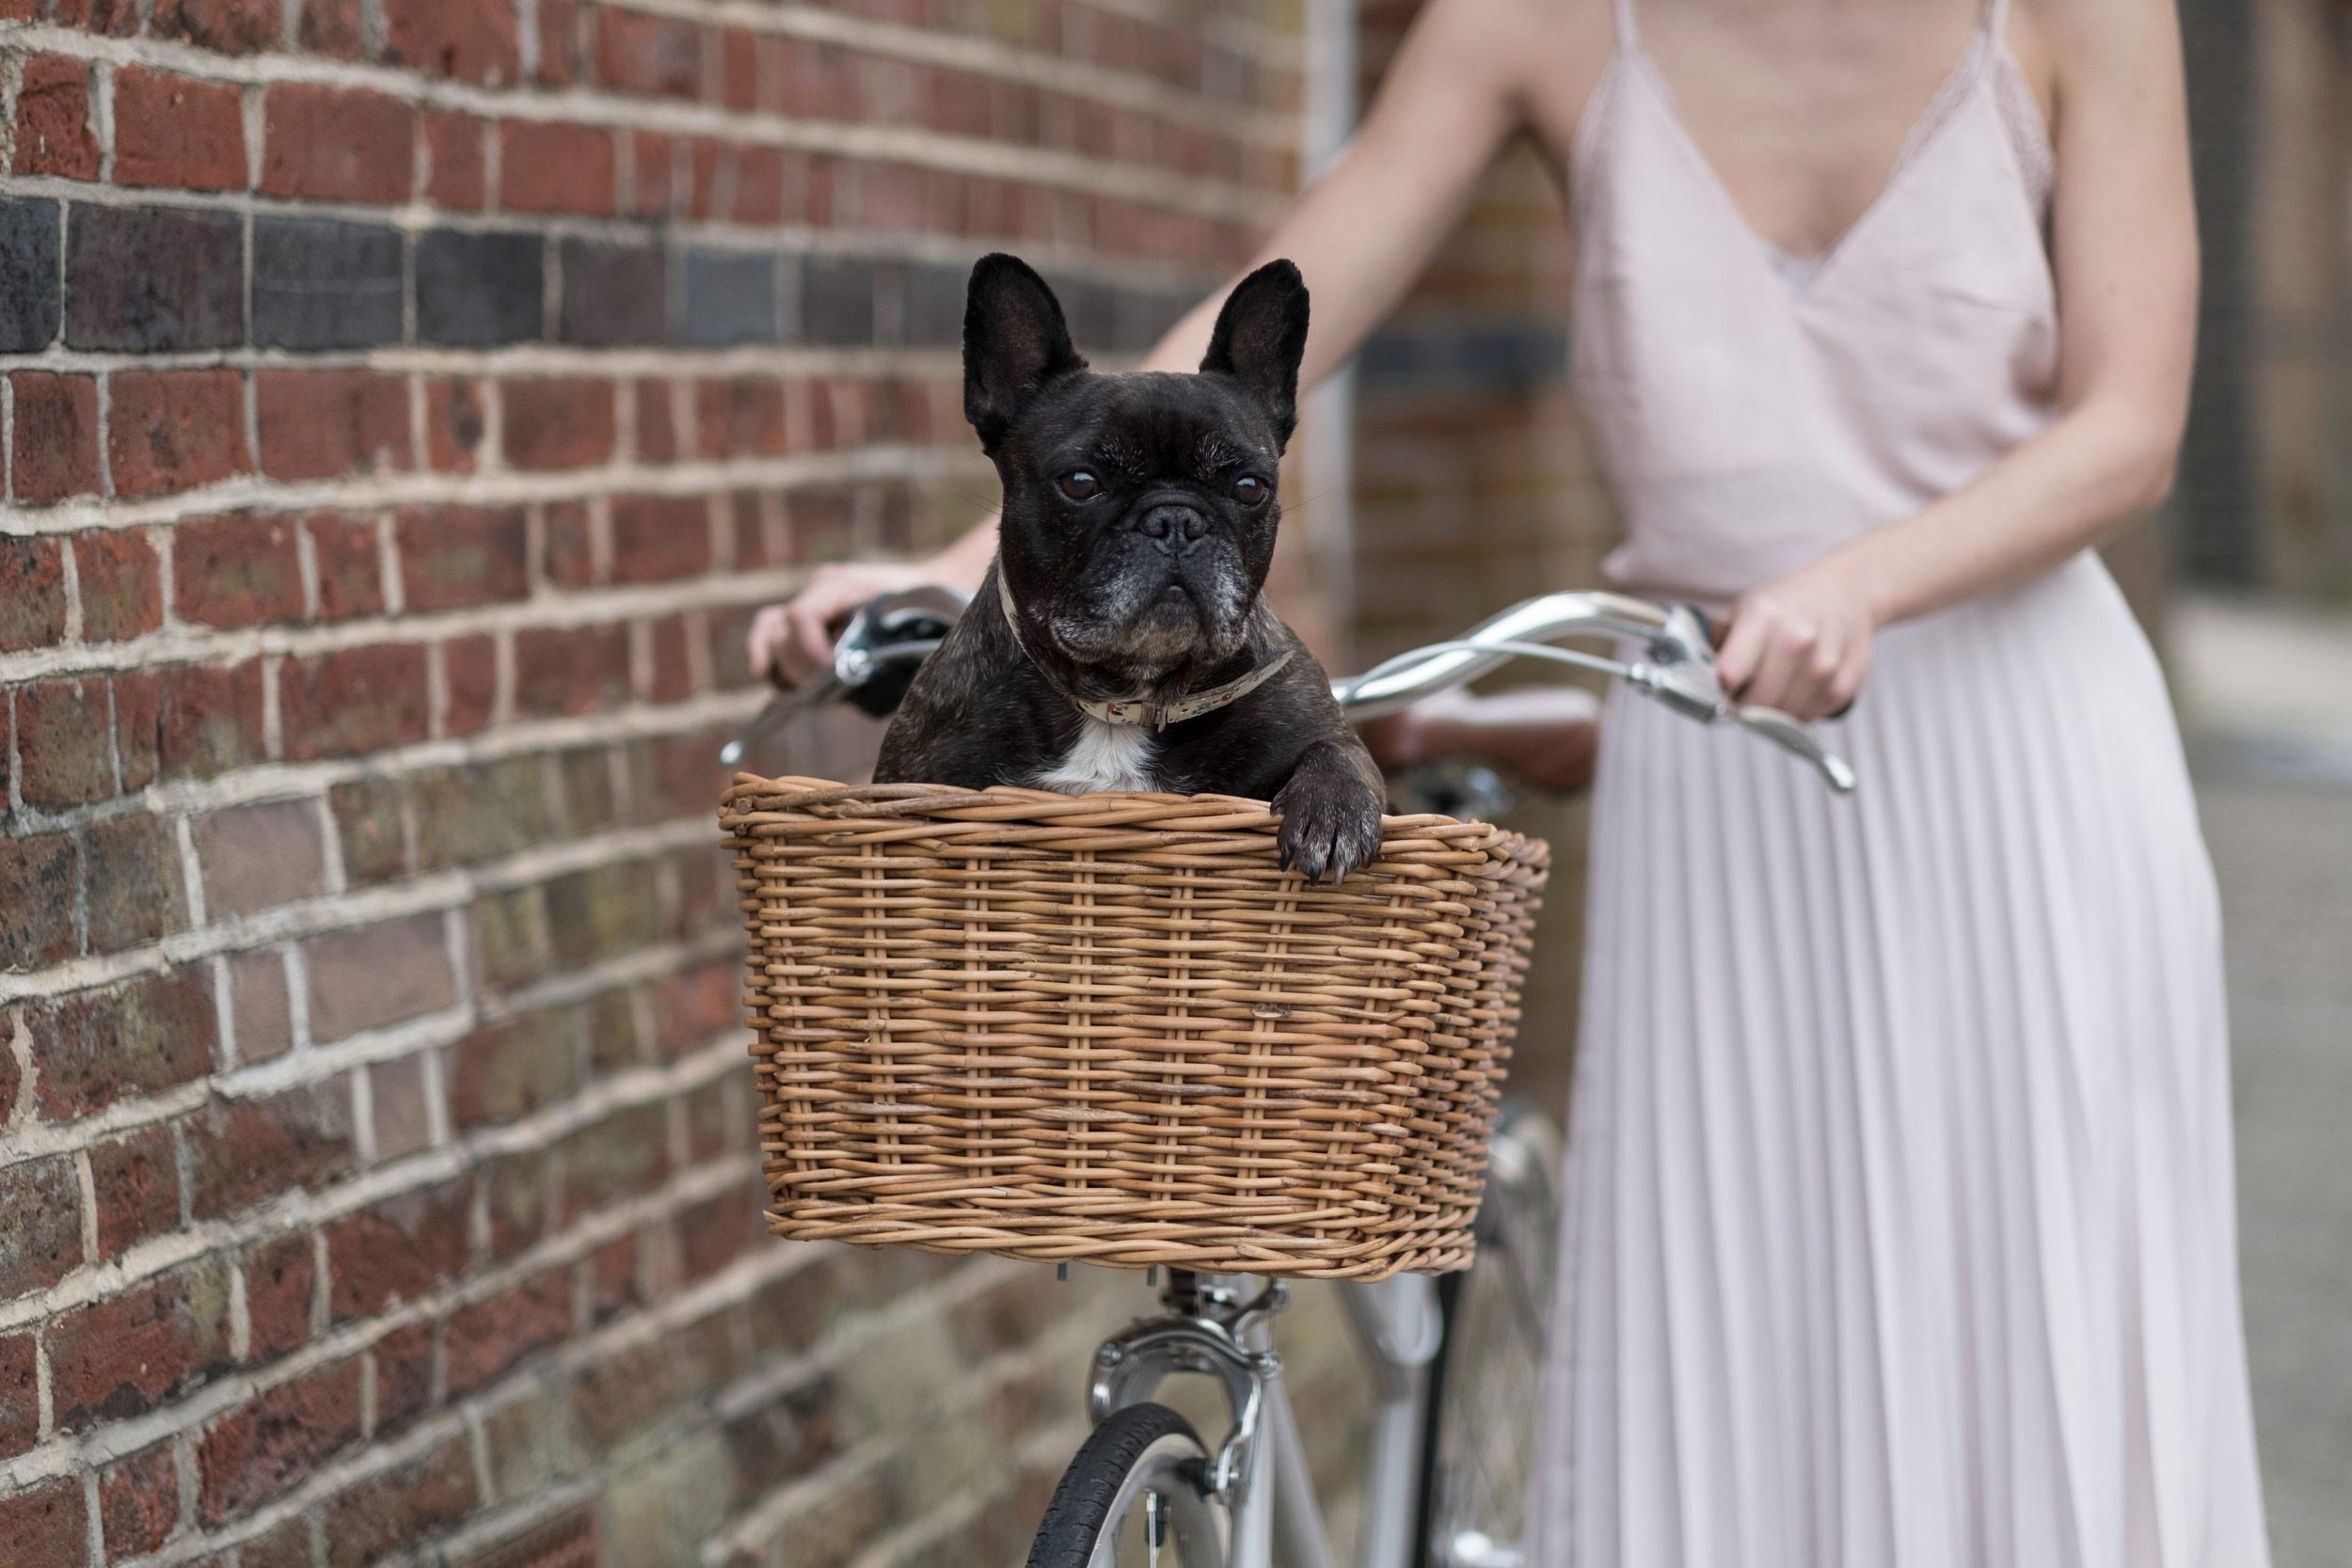 tokyobike-simple-minimal-norwich-fiona-burrage-photographer-dog-basket.jpg